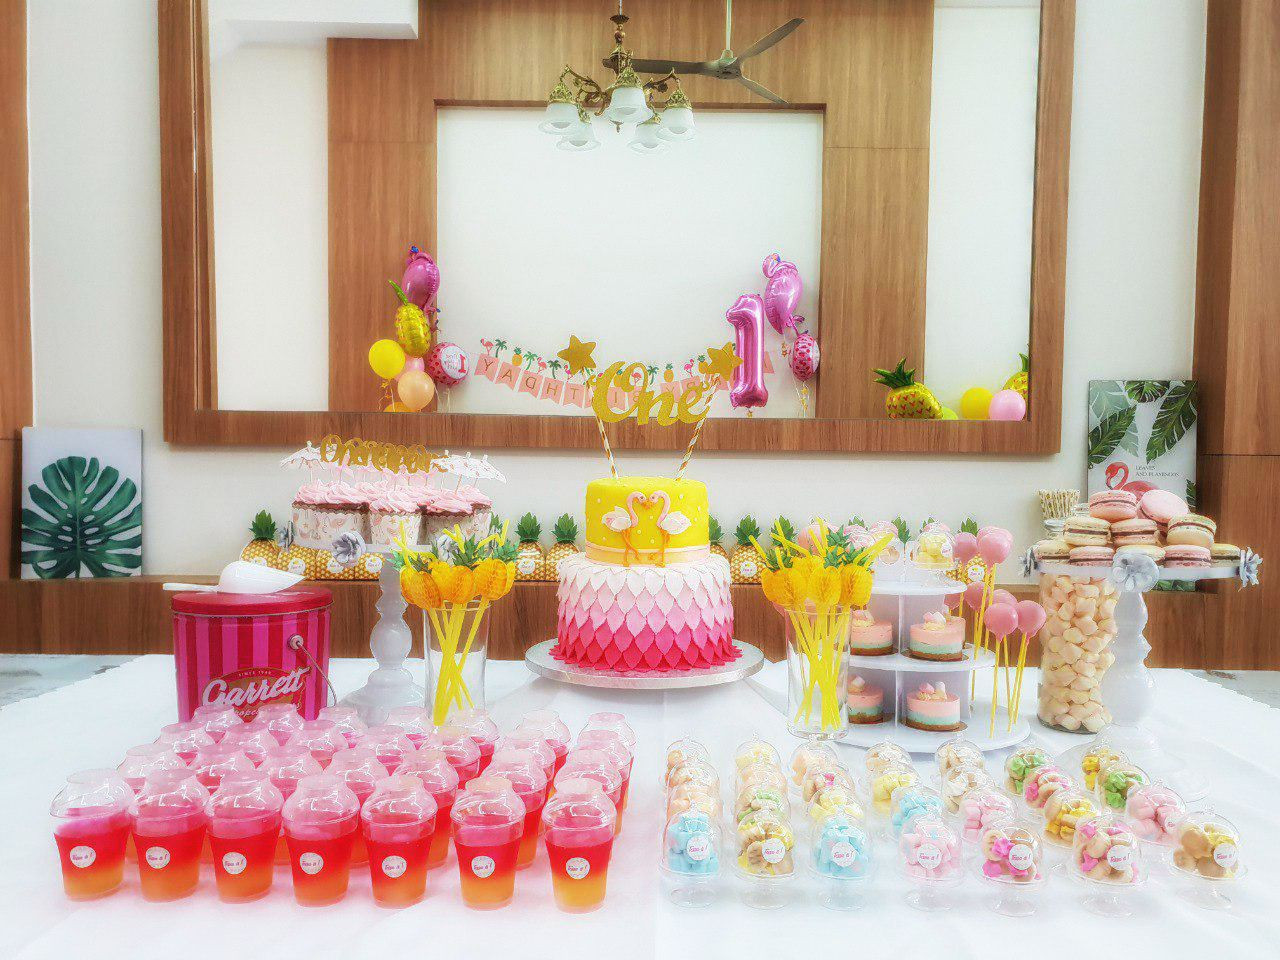 Tessa Dessert Table Spread.jpg